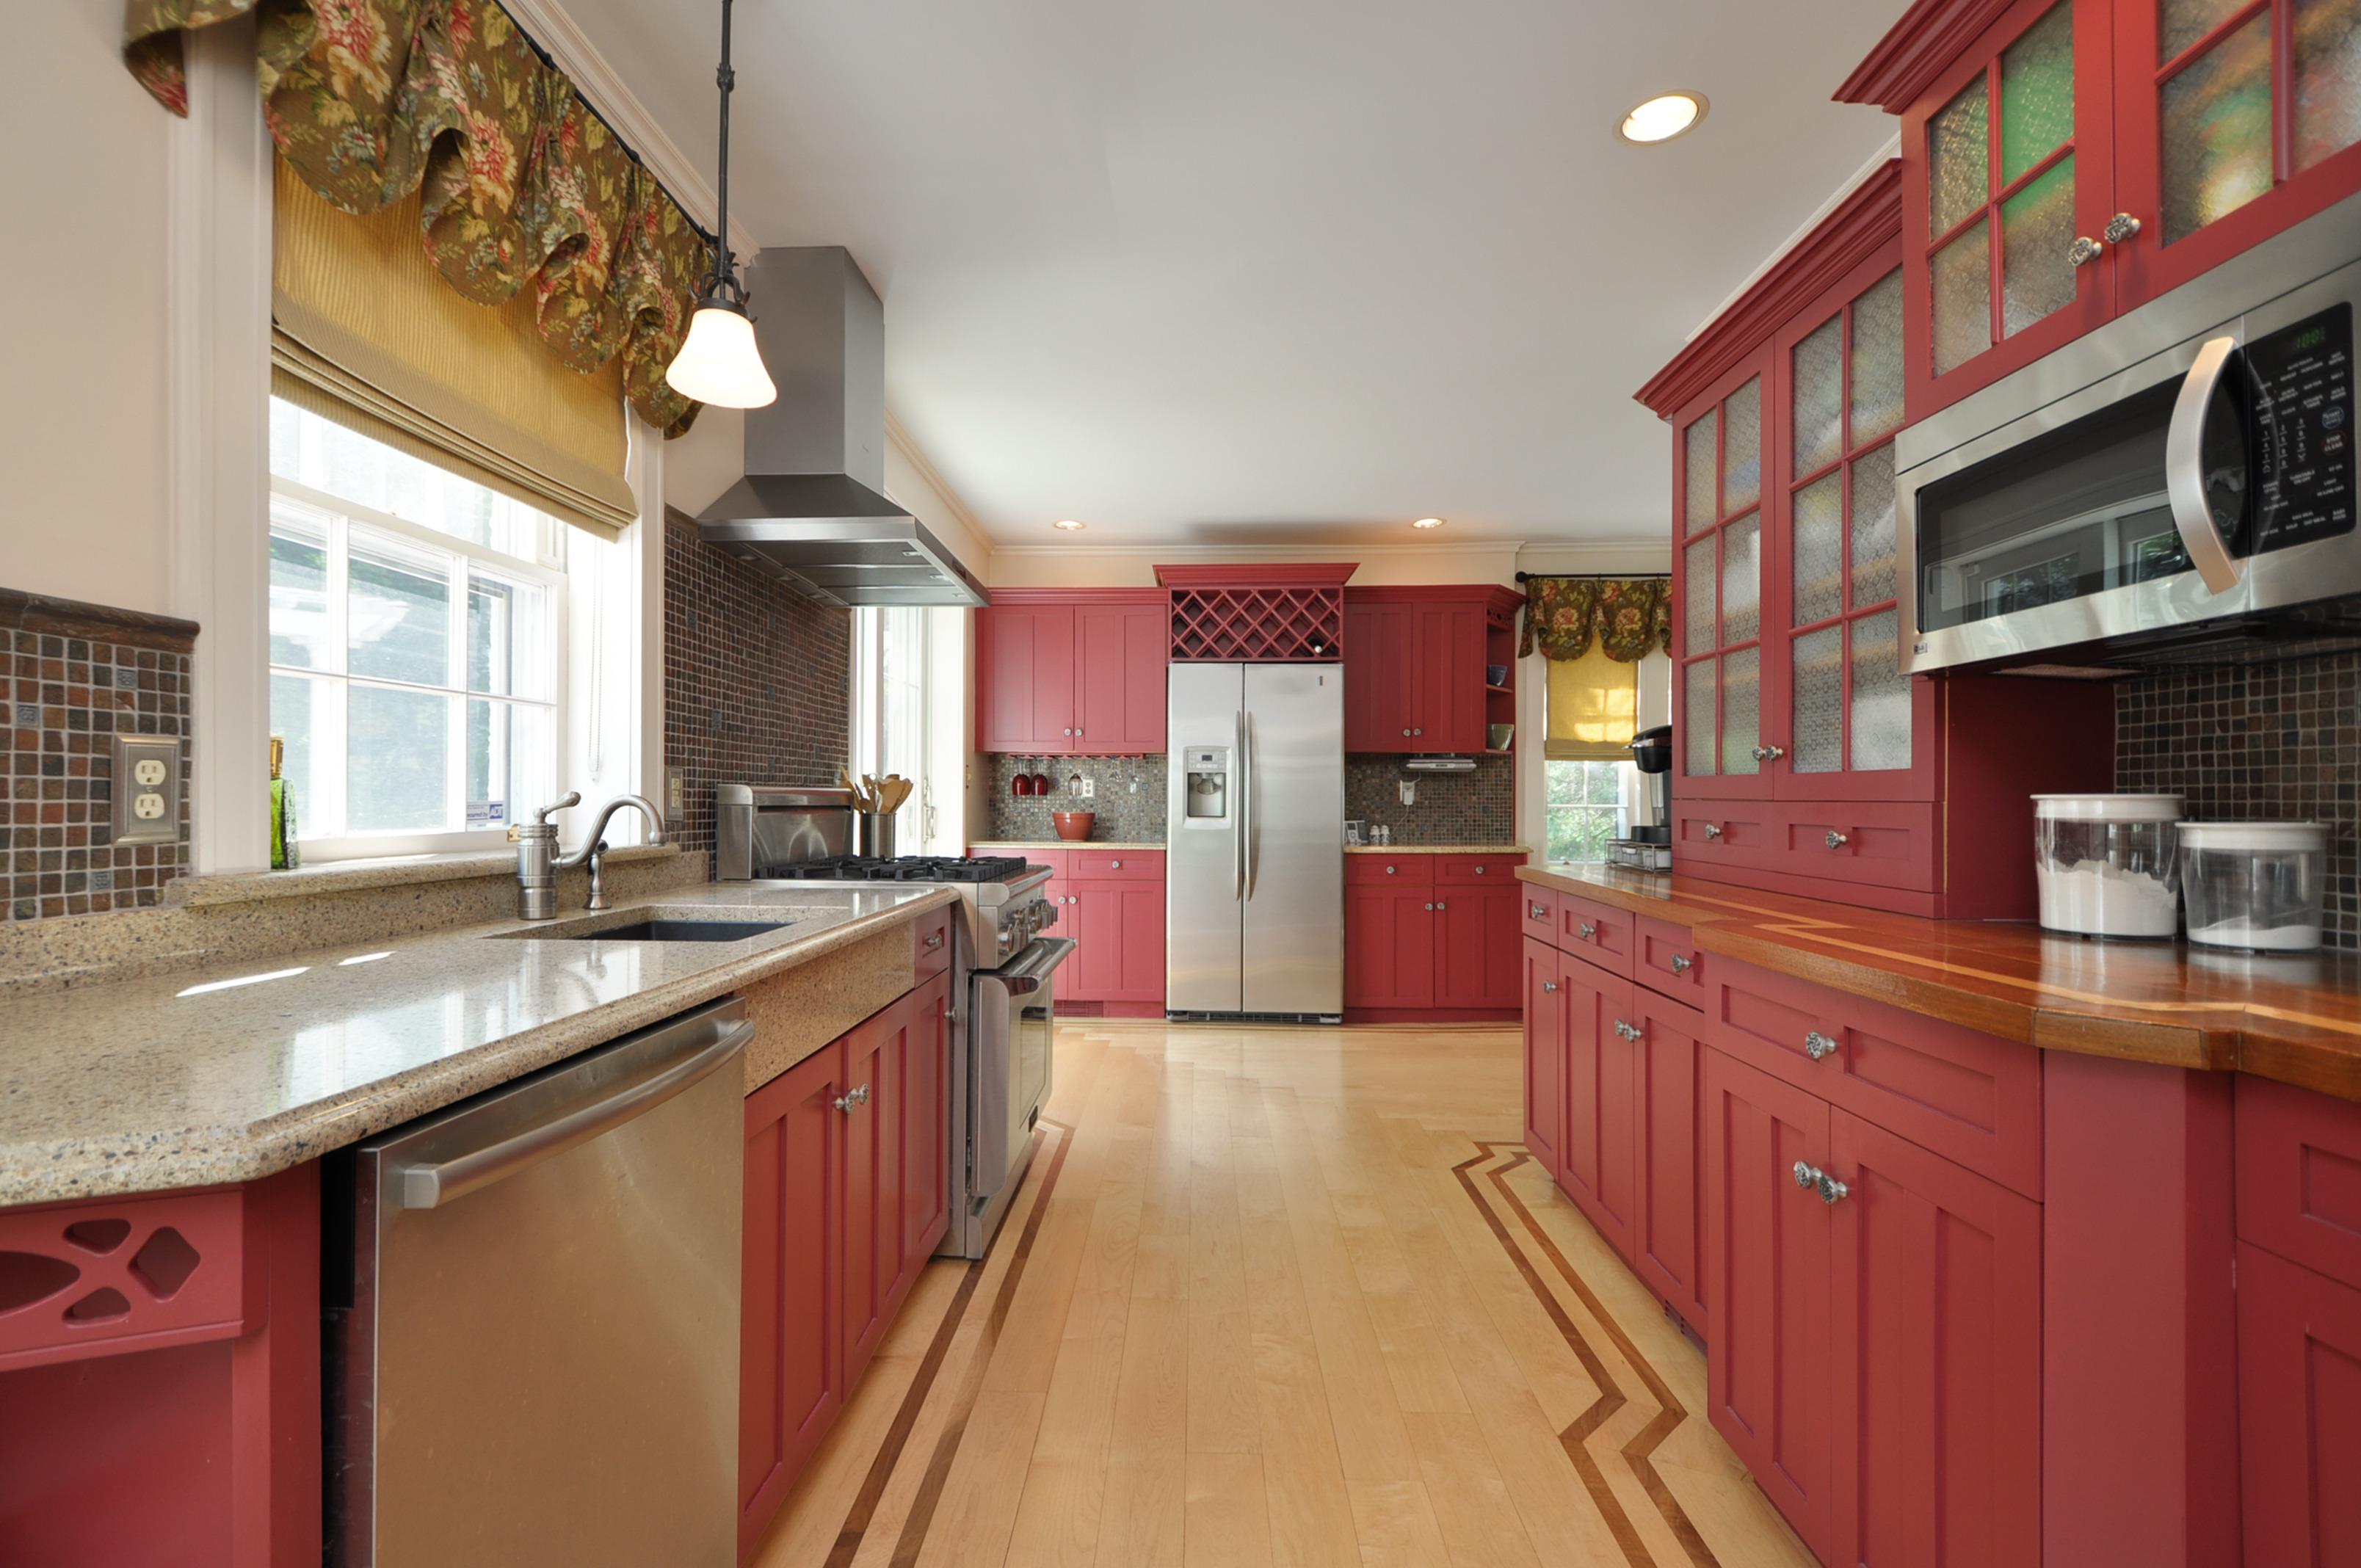 6f2f060a7c8d4c989ed2_long_kitchen.jpg